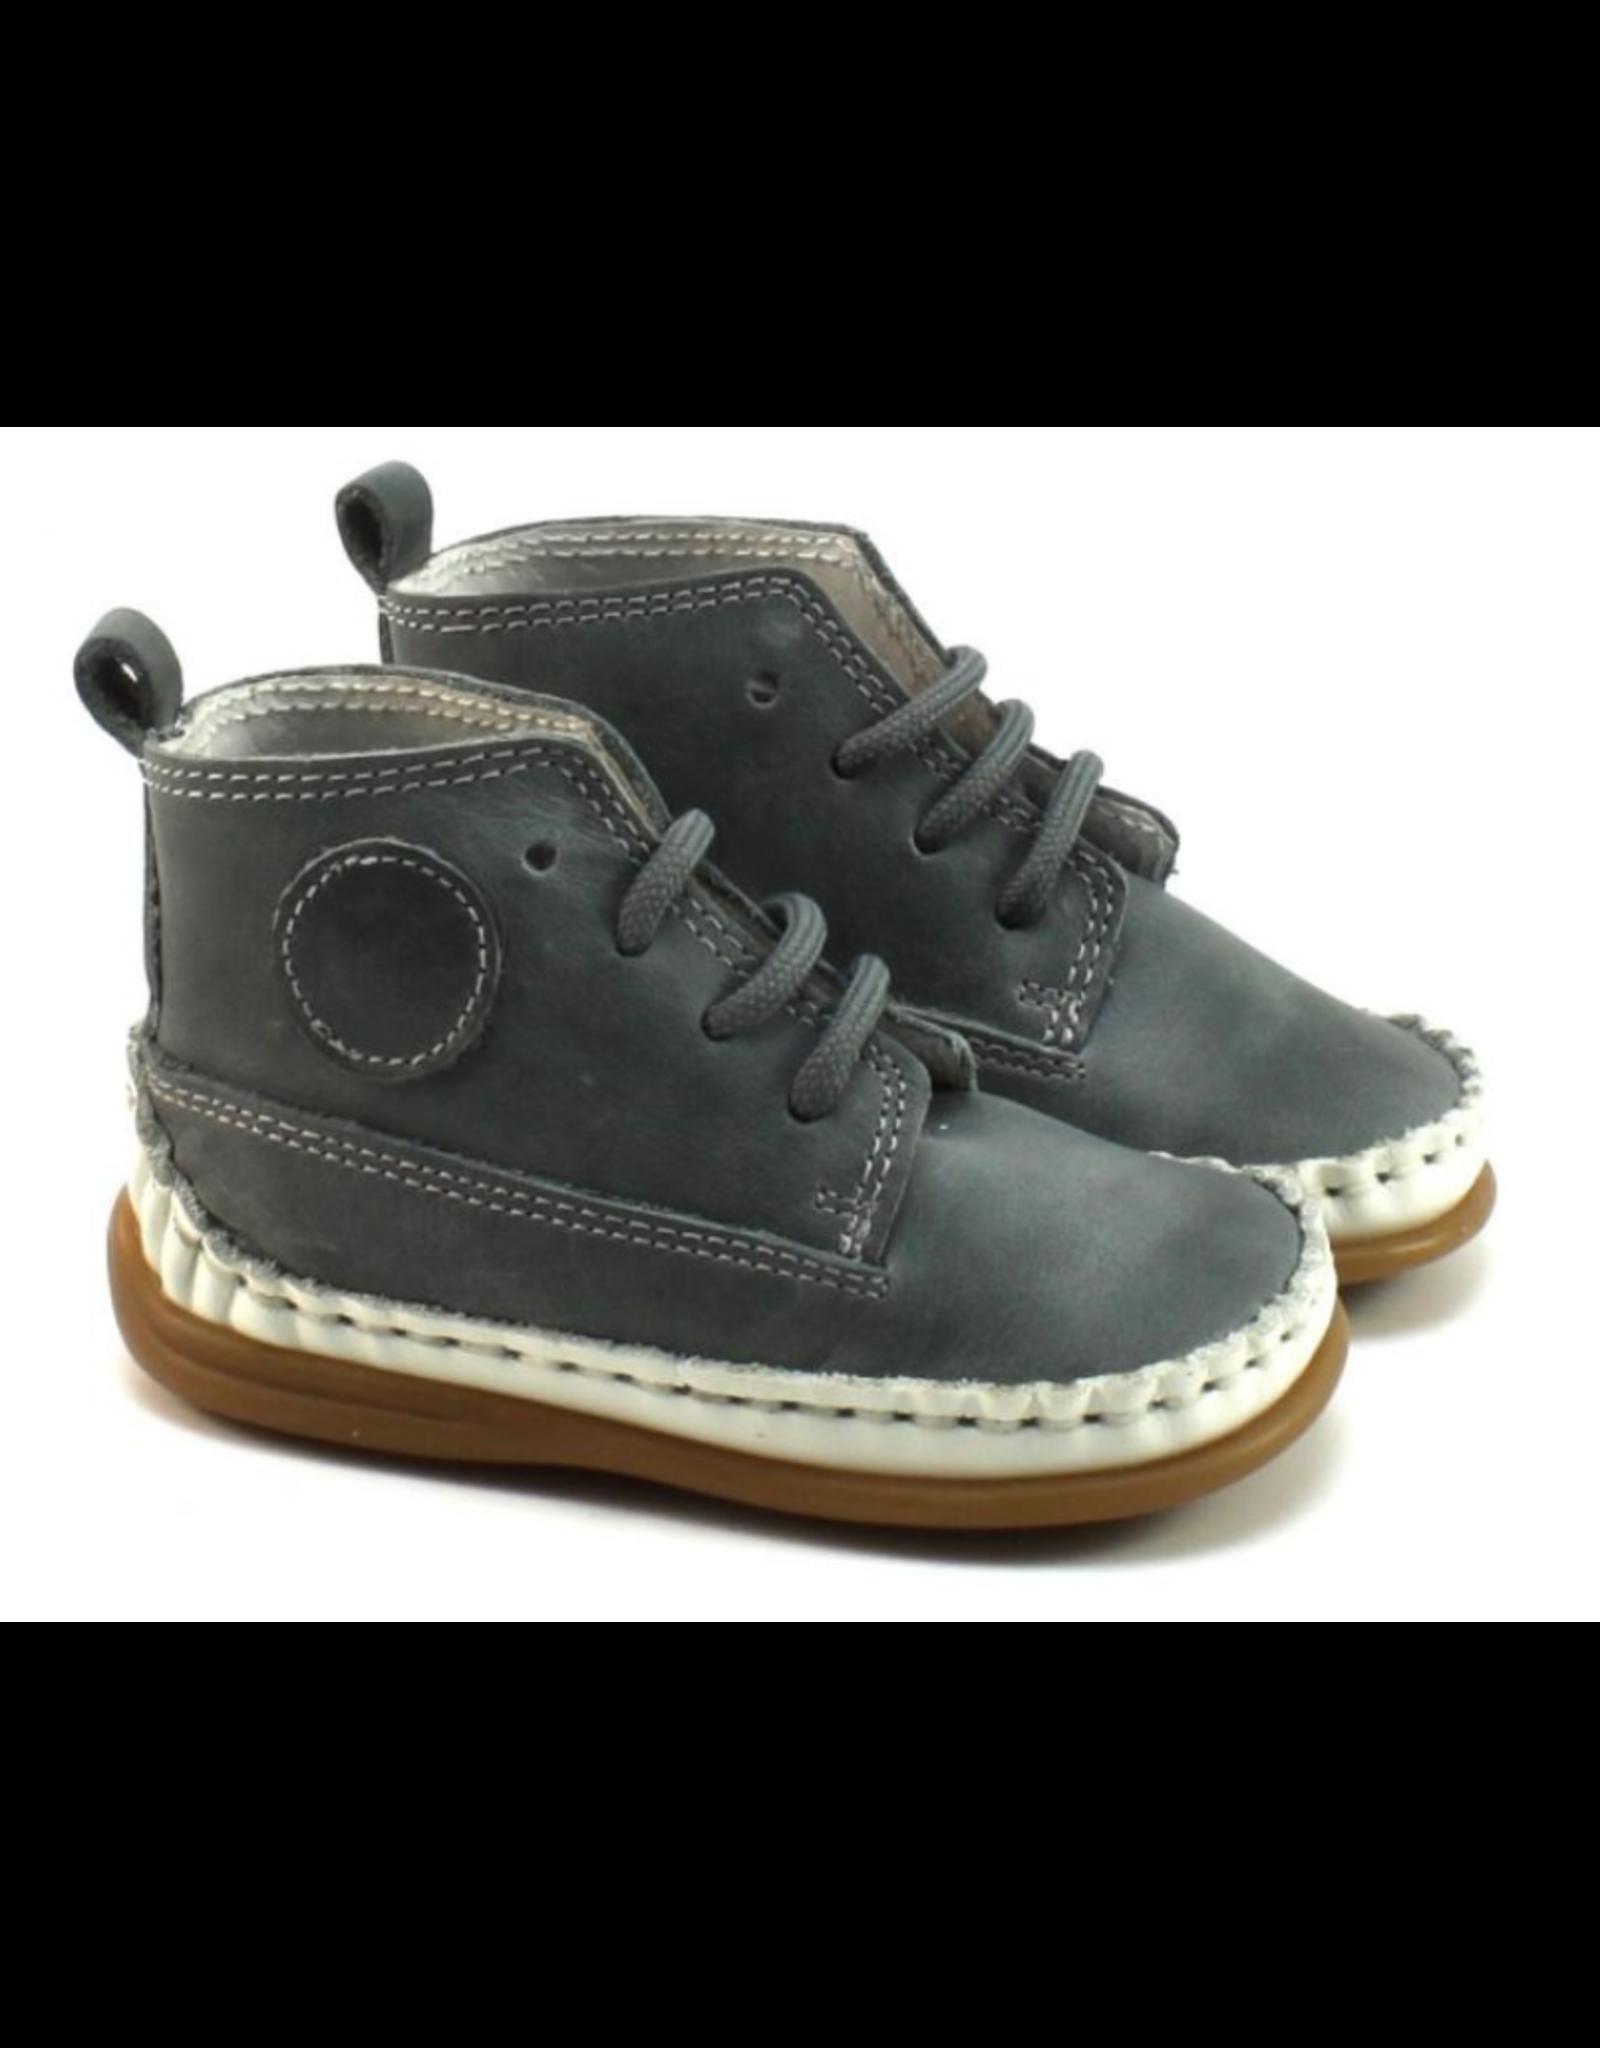 Bardossa Bardossa Babyschoentjes Stone-flex Arizona Jeans